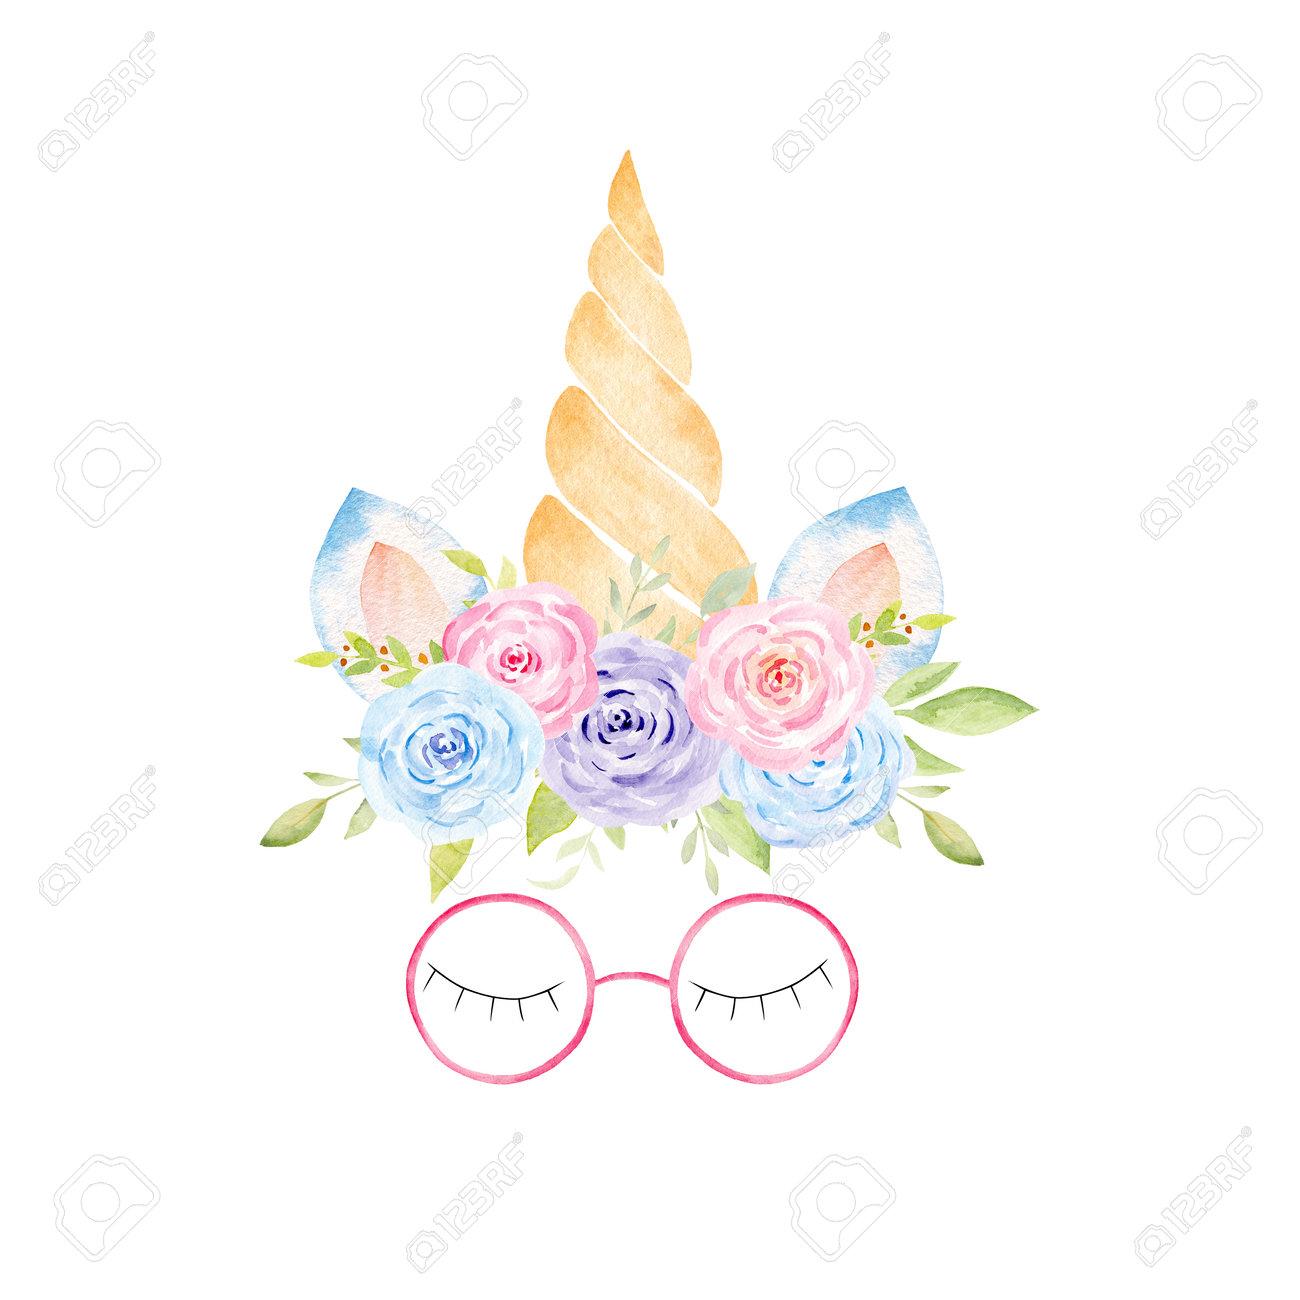 Watercolor unicorn head. Hand painted clipart. Fantasy graphics for baby shower invitation, kids nursery decor, fabrics, textile. - 171458692